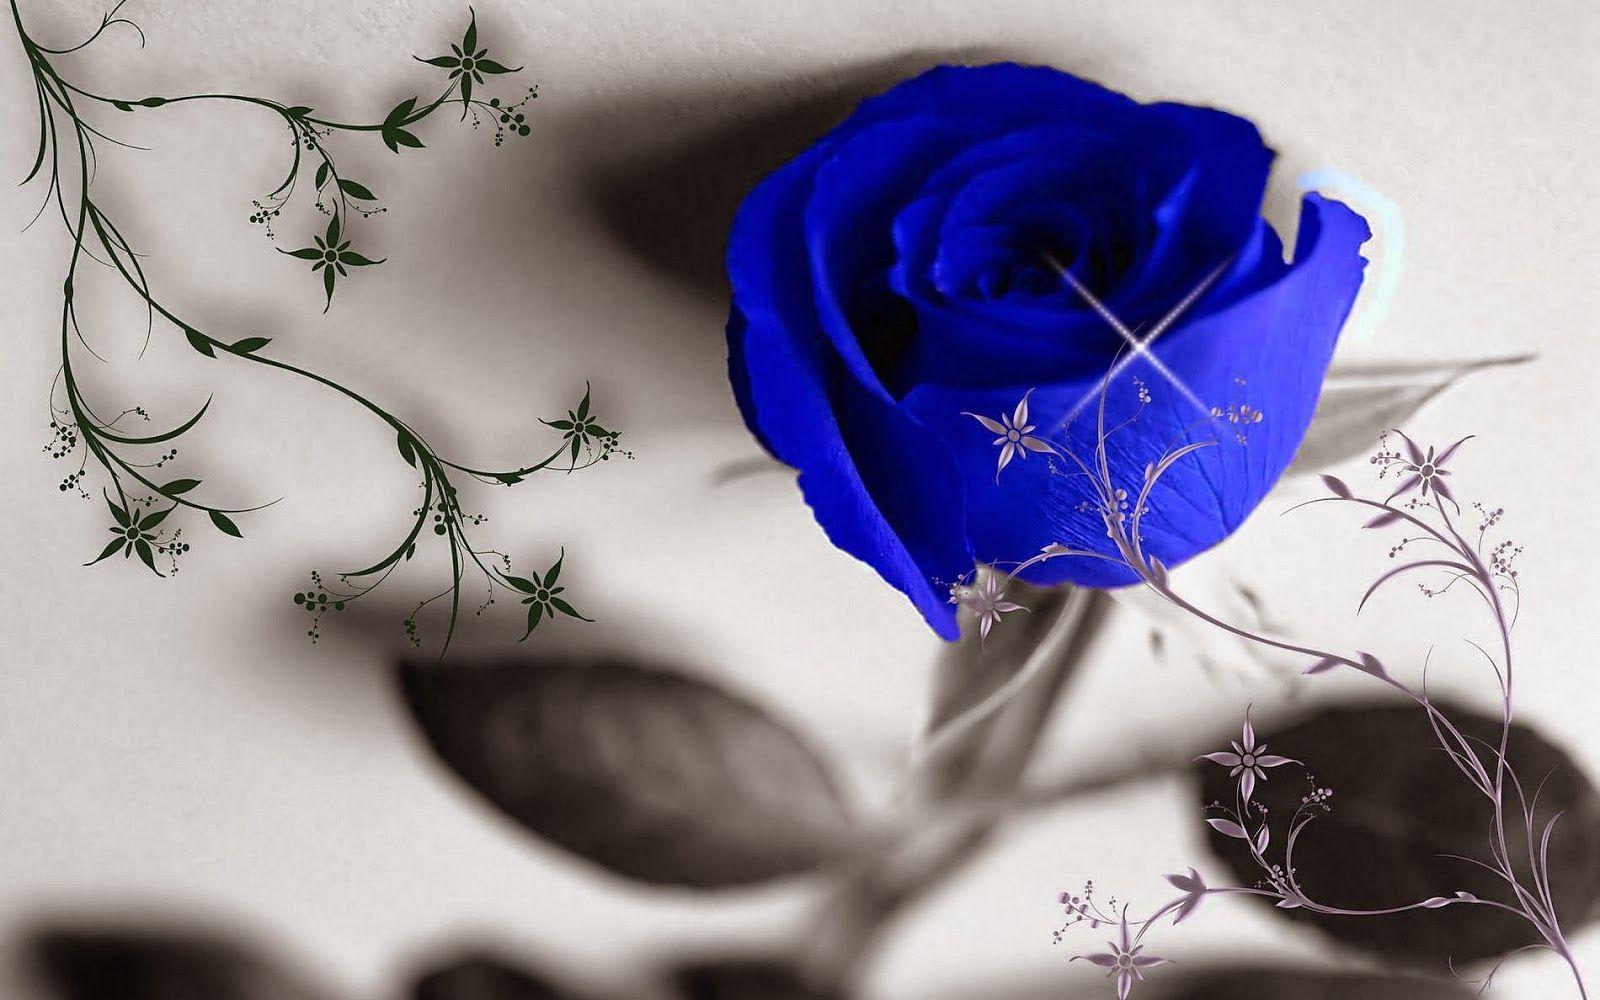 Blue Roses Pichttp My143rose Blogspot Com Blue Rose Wallpaper Blue Roses Rose Wallpaper